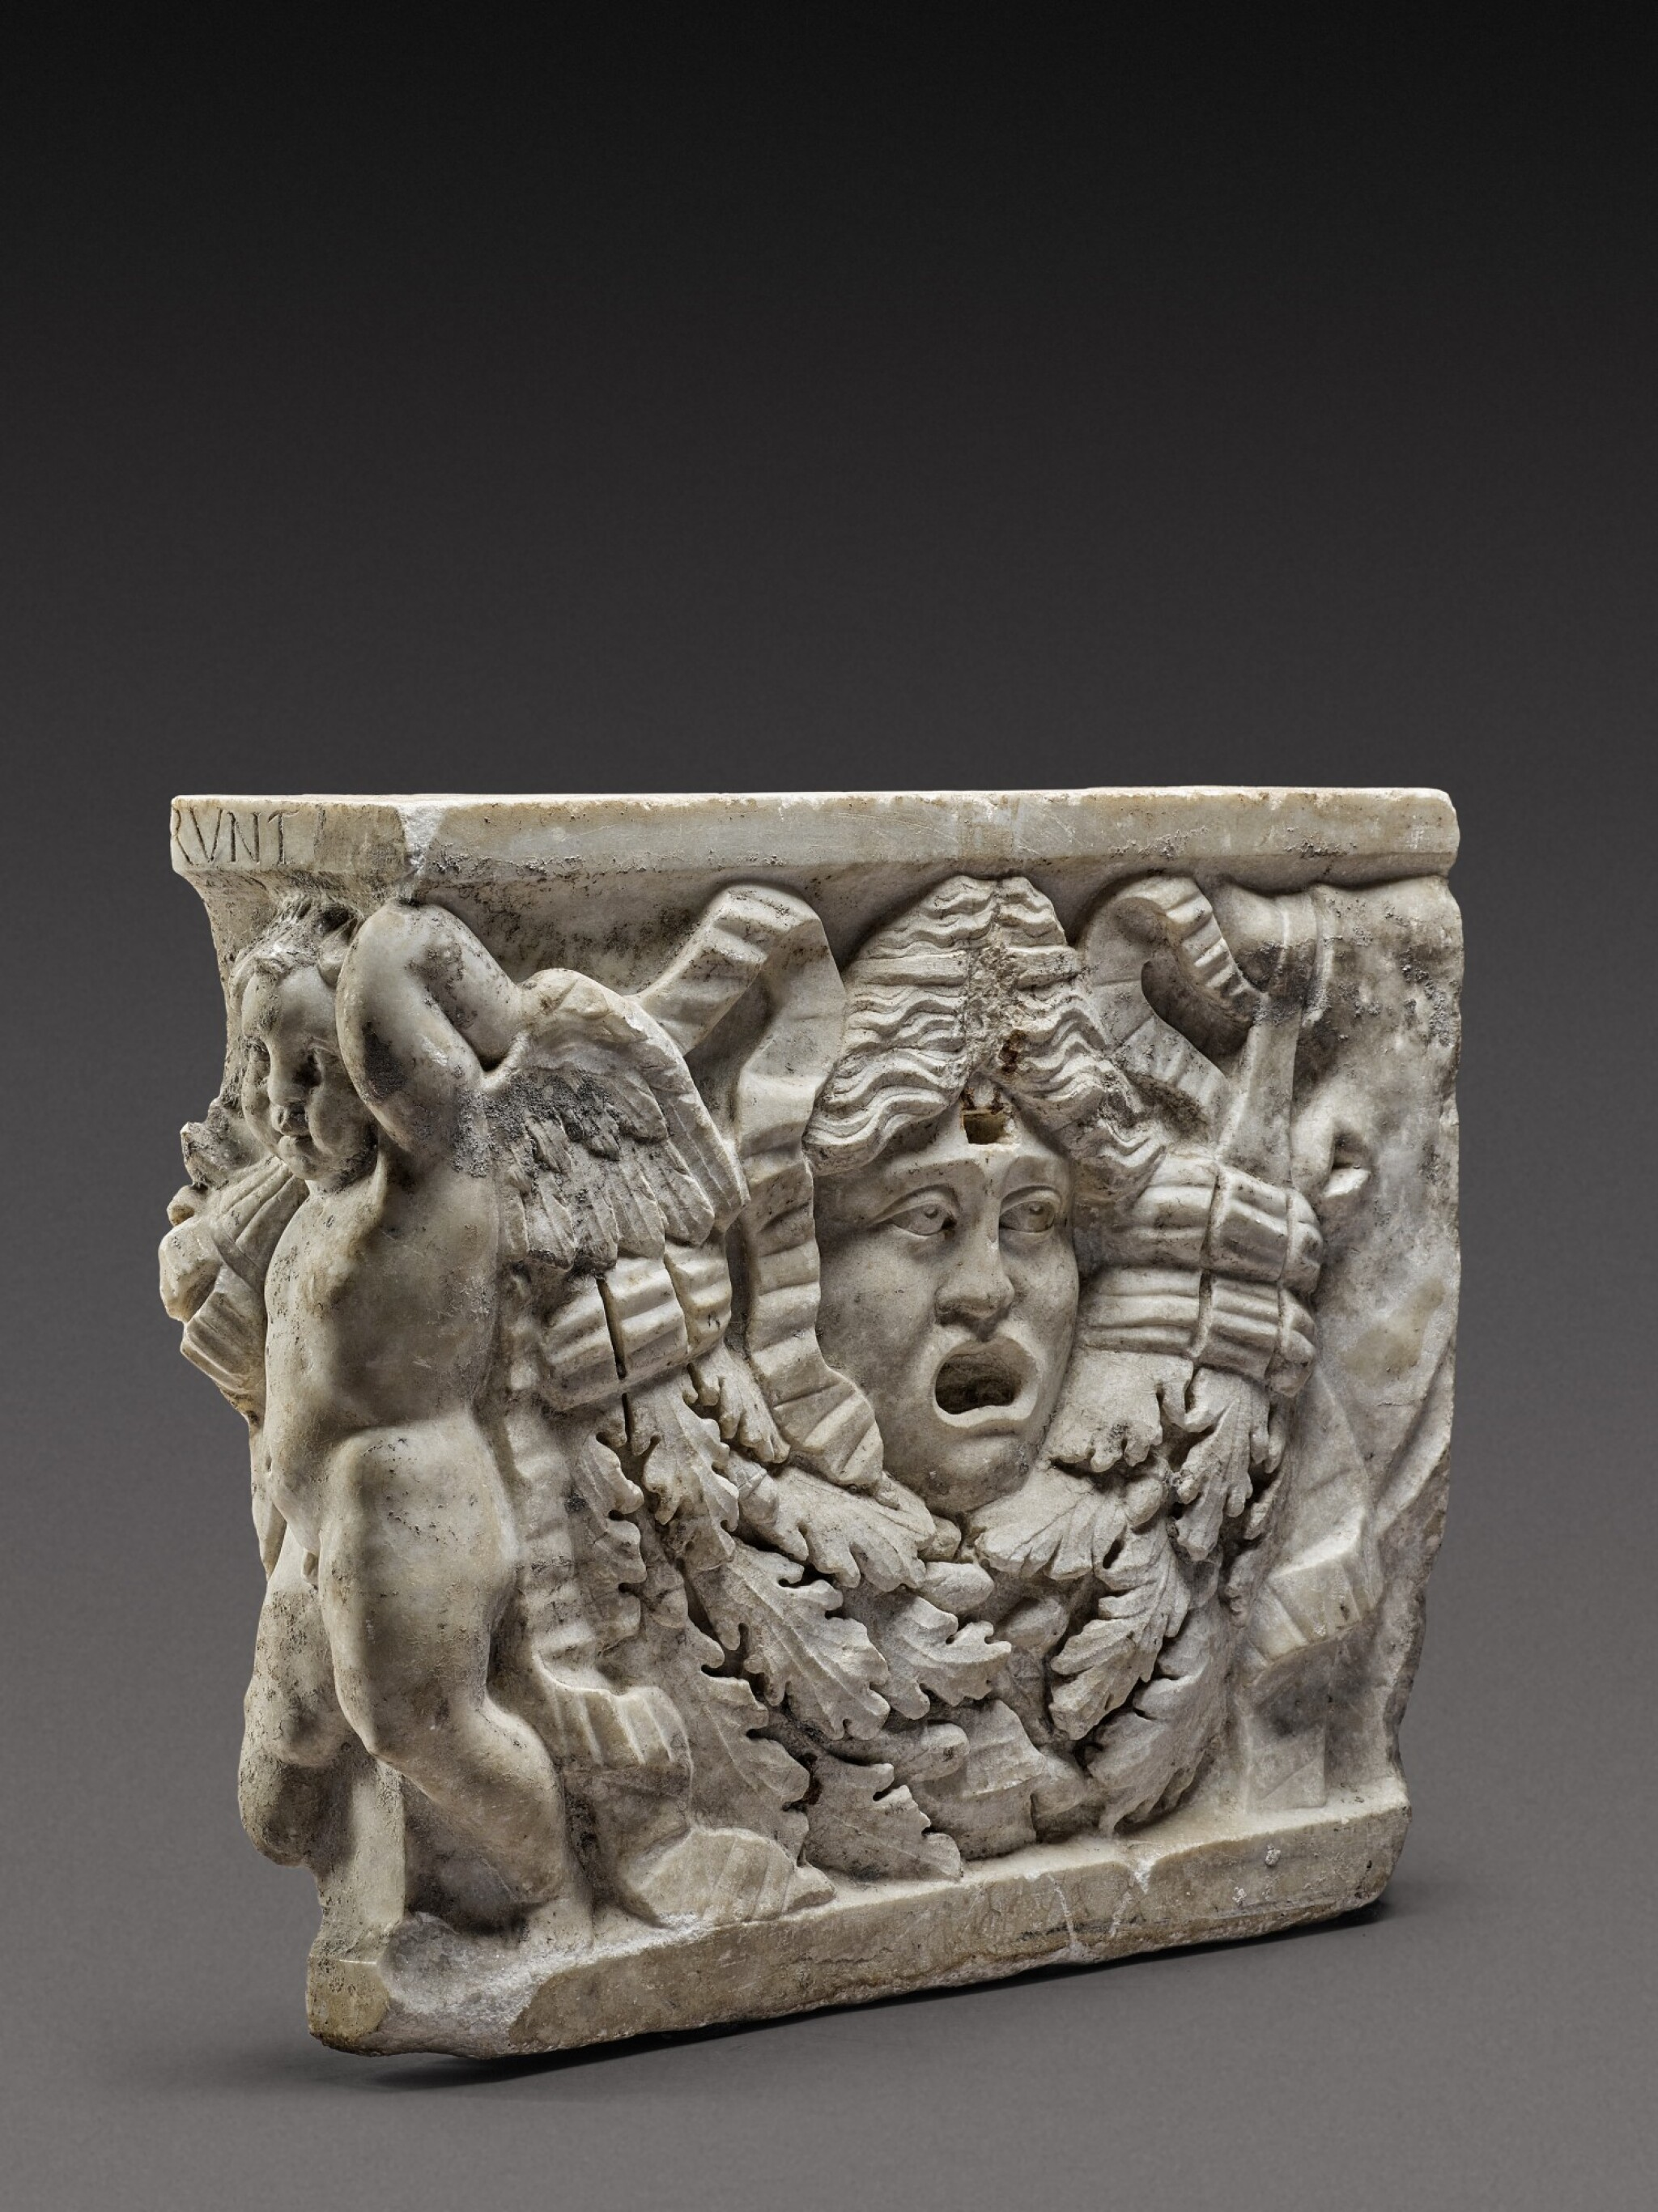 View 1 of Lot 80. A Roman Marble Garland Sarcophagus Fragment, circa A.D. 135.